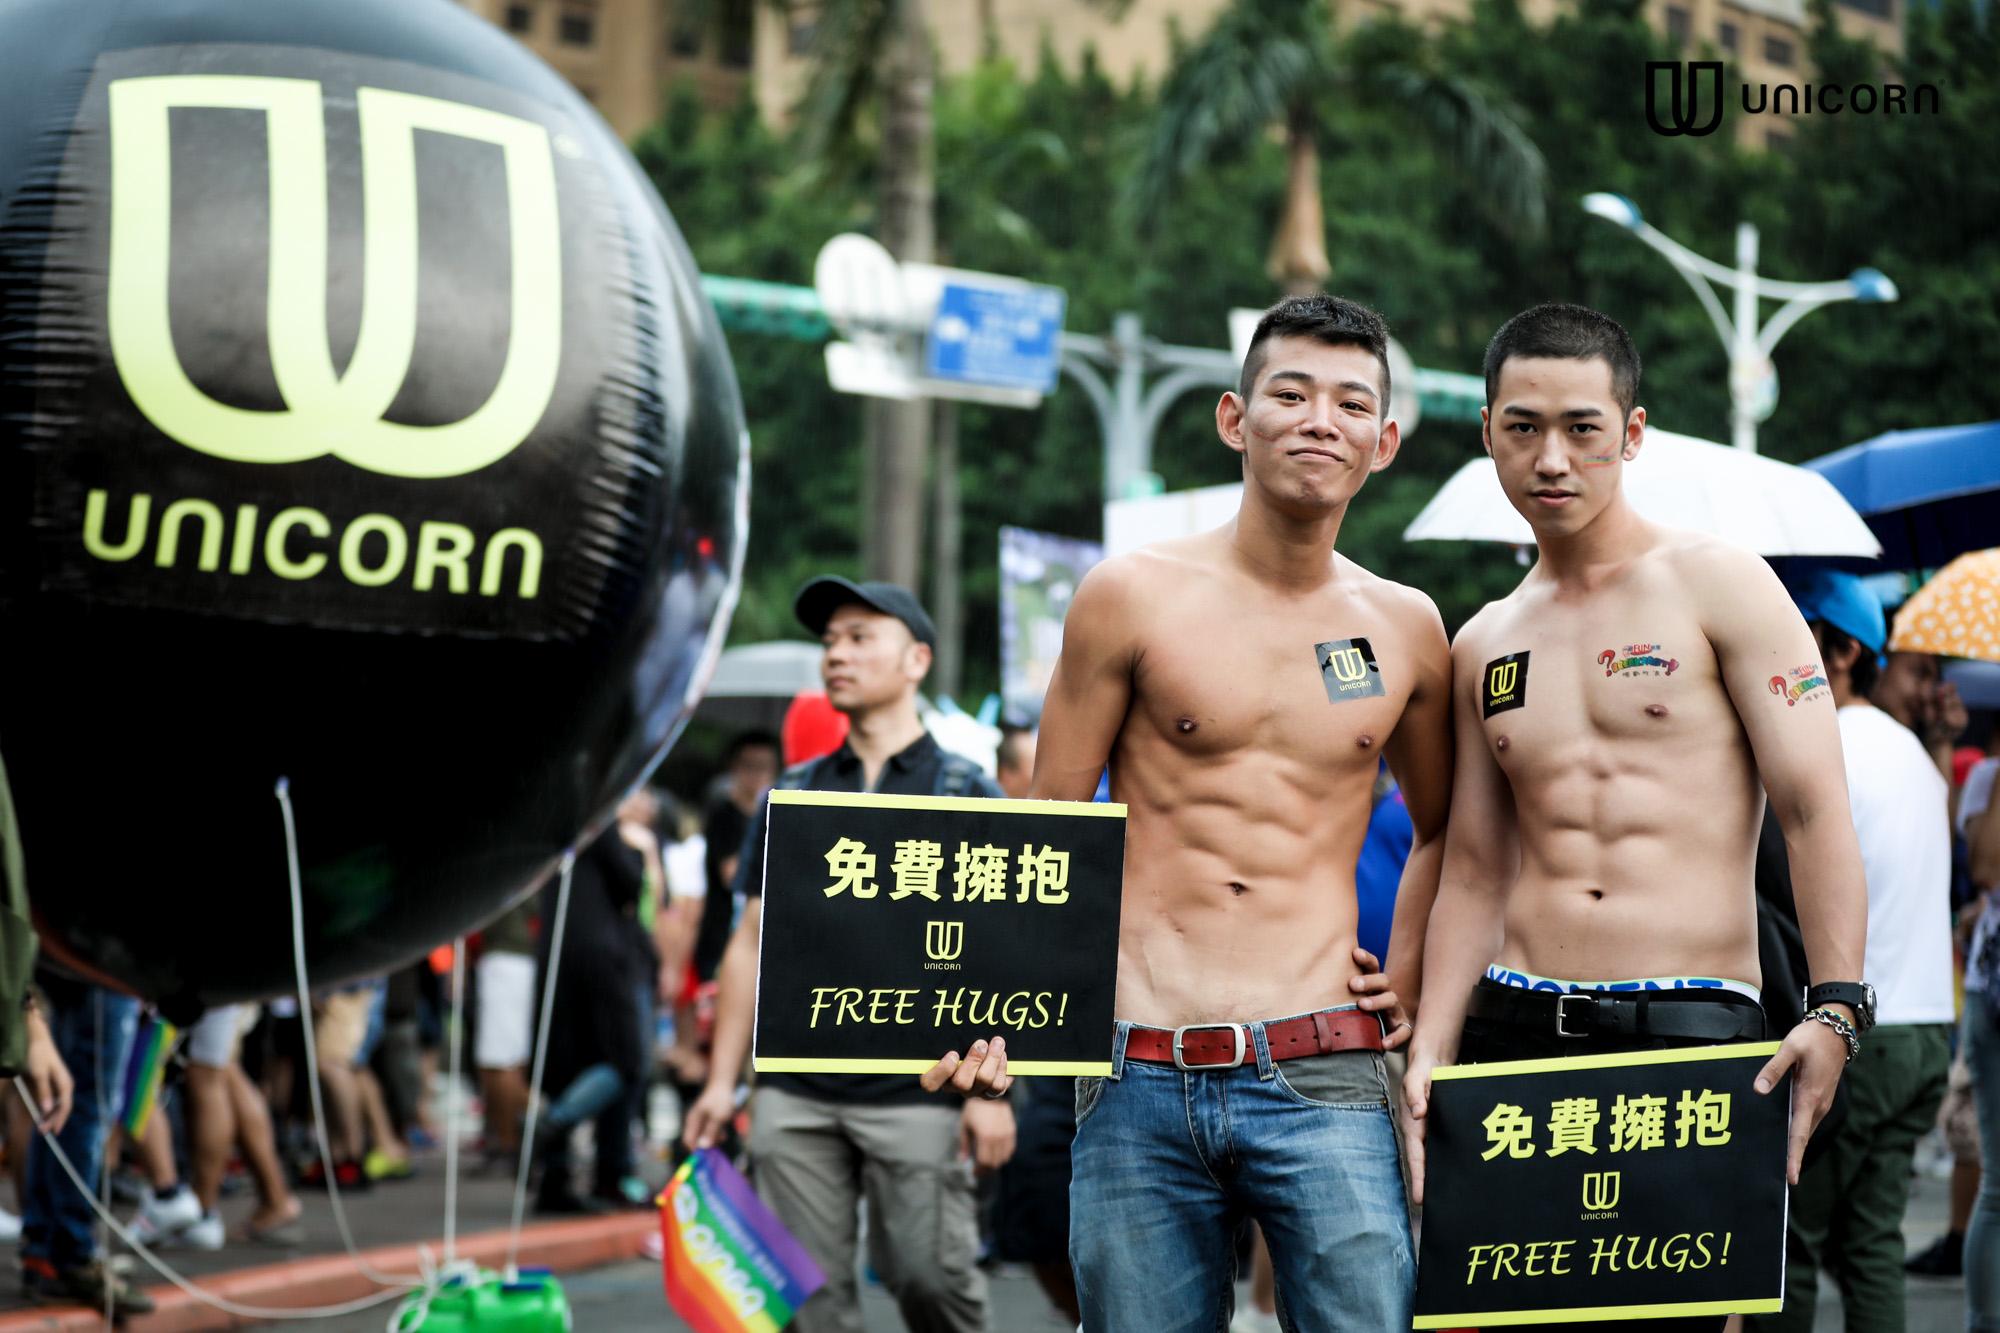 14th Taiwan LGBT Pride x Unicorn